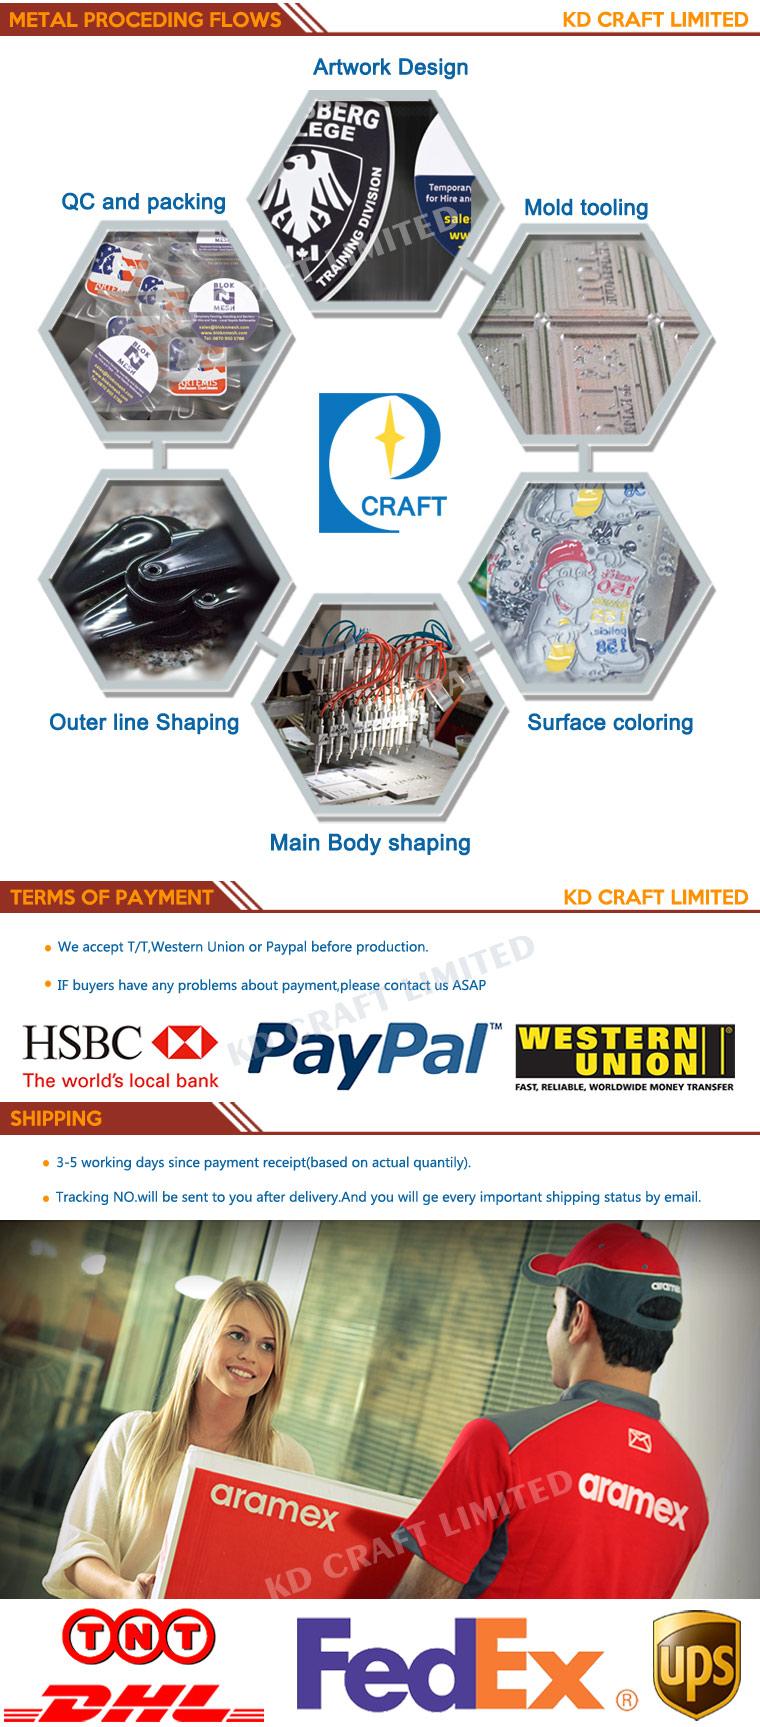 Factory Wholesale Customized Car Brand Promotional PVC 3D Key Chain as Souvenir Gift